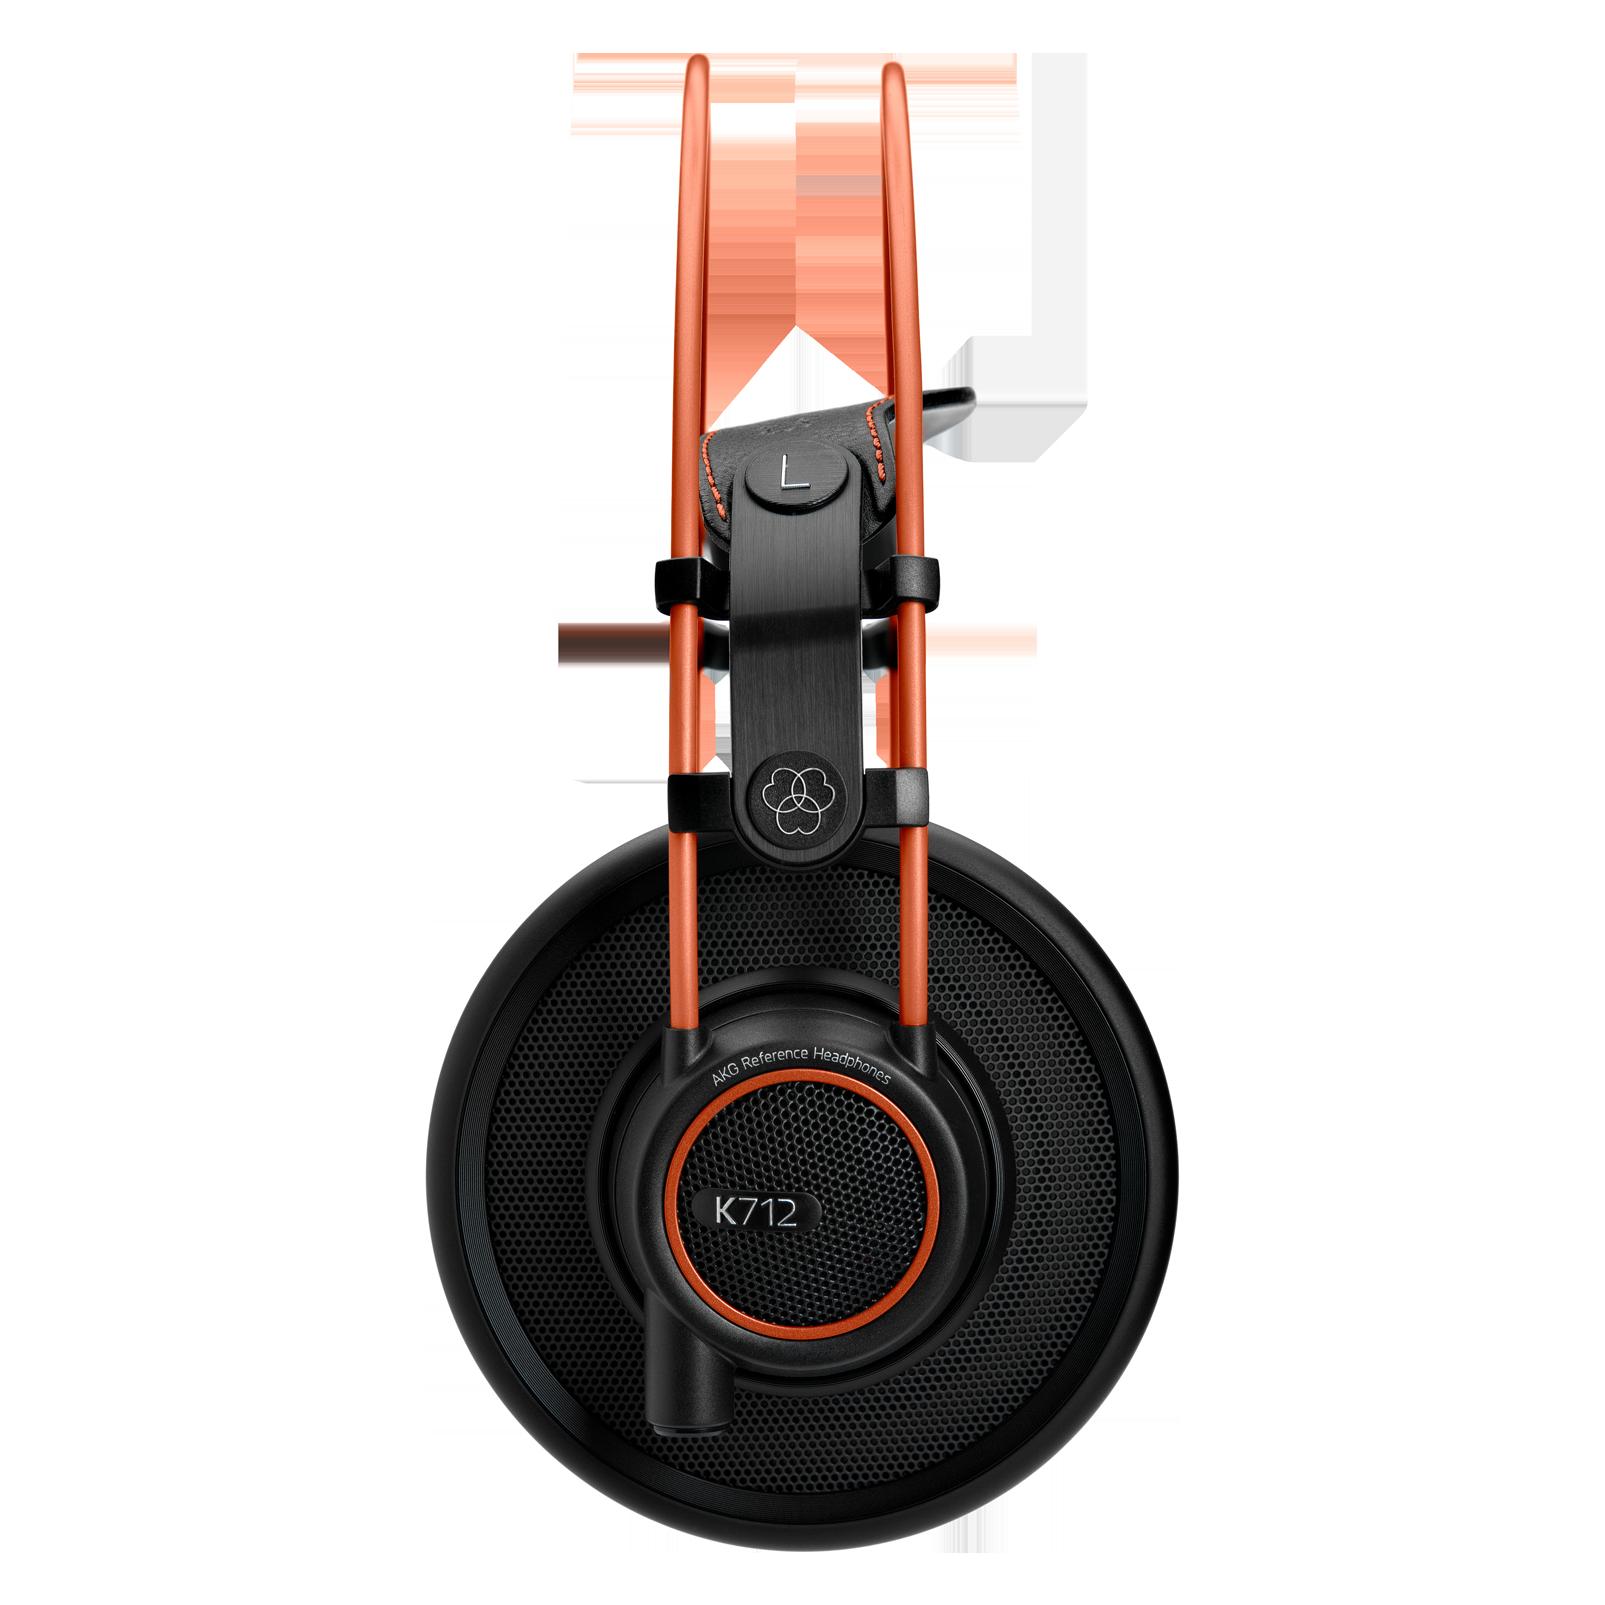 K712 PRO - Black - Reference studio headphones  - Left